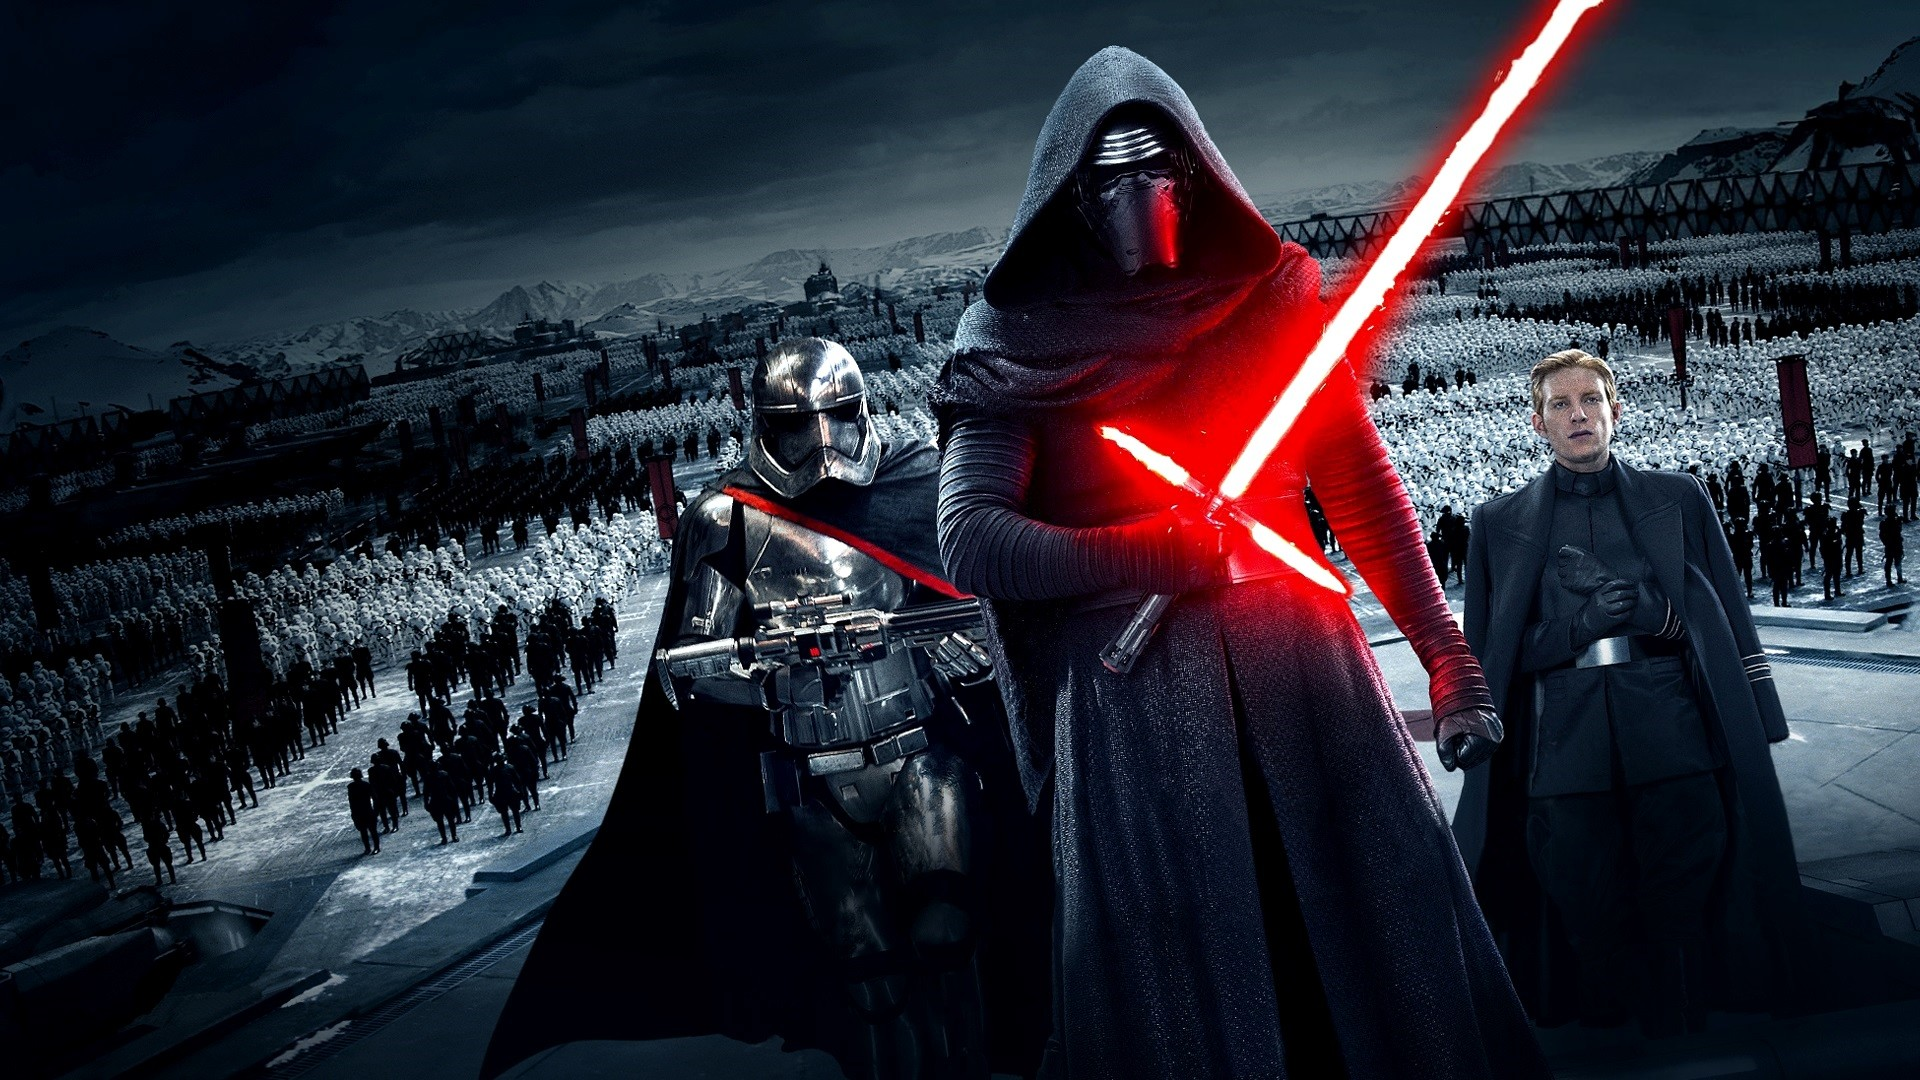 Explore Star Wars 7, Star Wars Kylo Ren, and more!